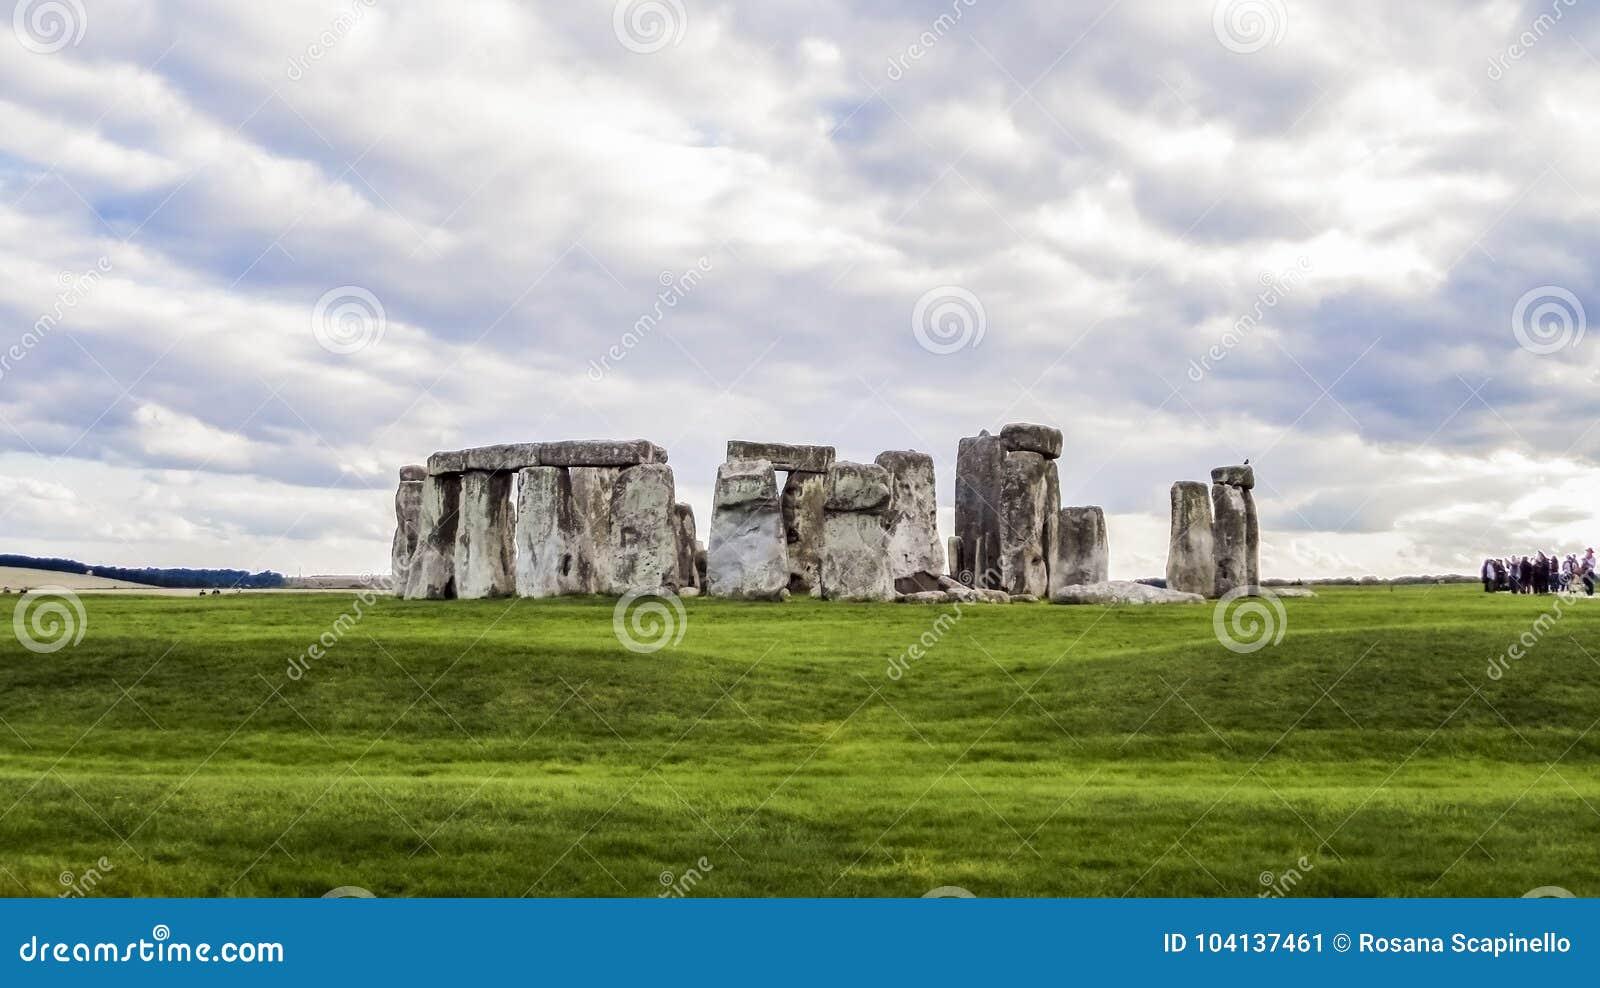 Monumento pré-histórico de Stonehenge, grama verde, nuvens, vista panorâmica - Wiltshire, Salisbúria, Inglaterra